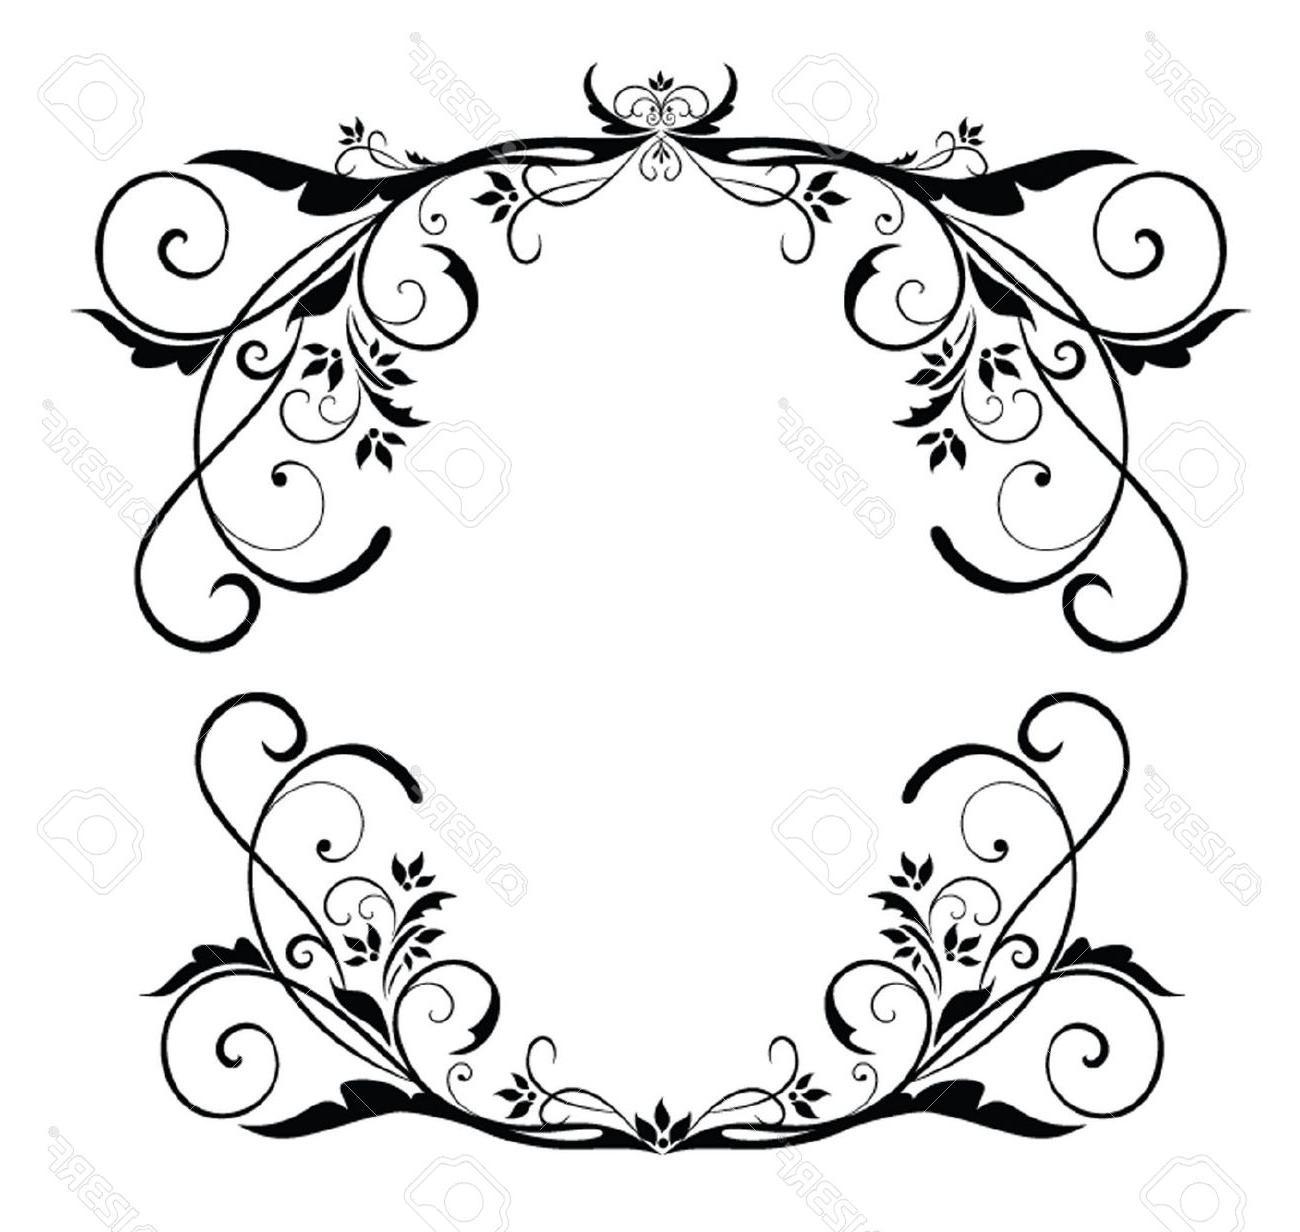 1300x1232 Best 15 Vintage Black Frame Stock Vector Wedding Menu Border File Free